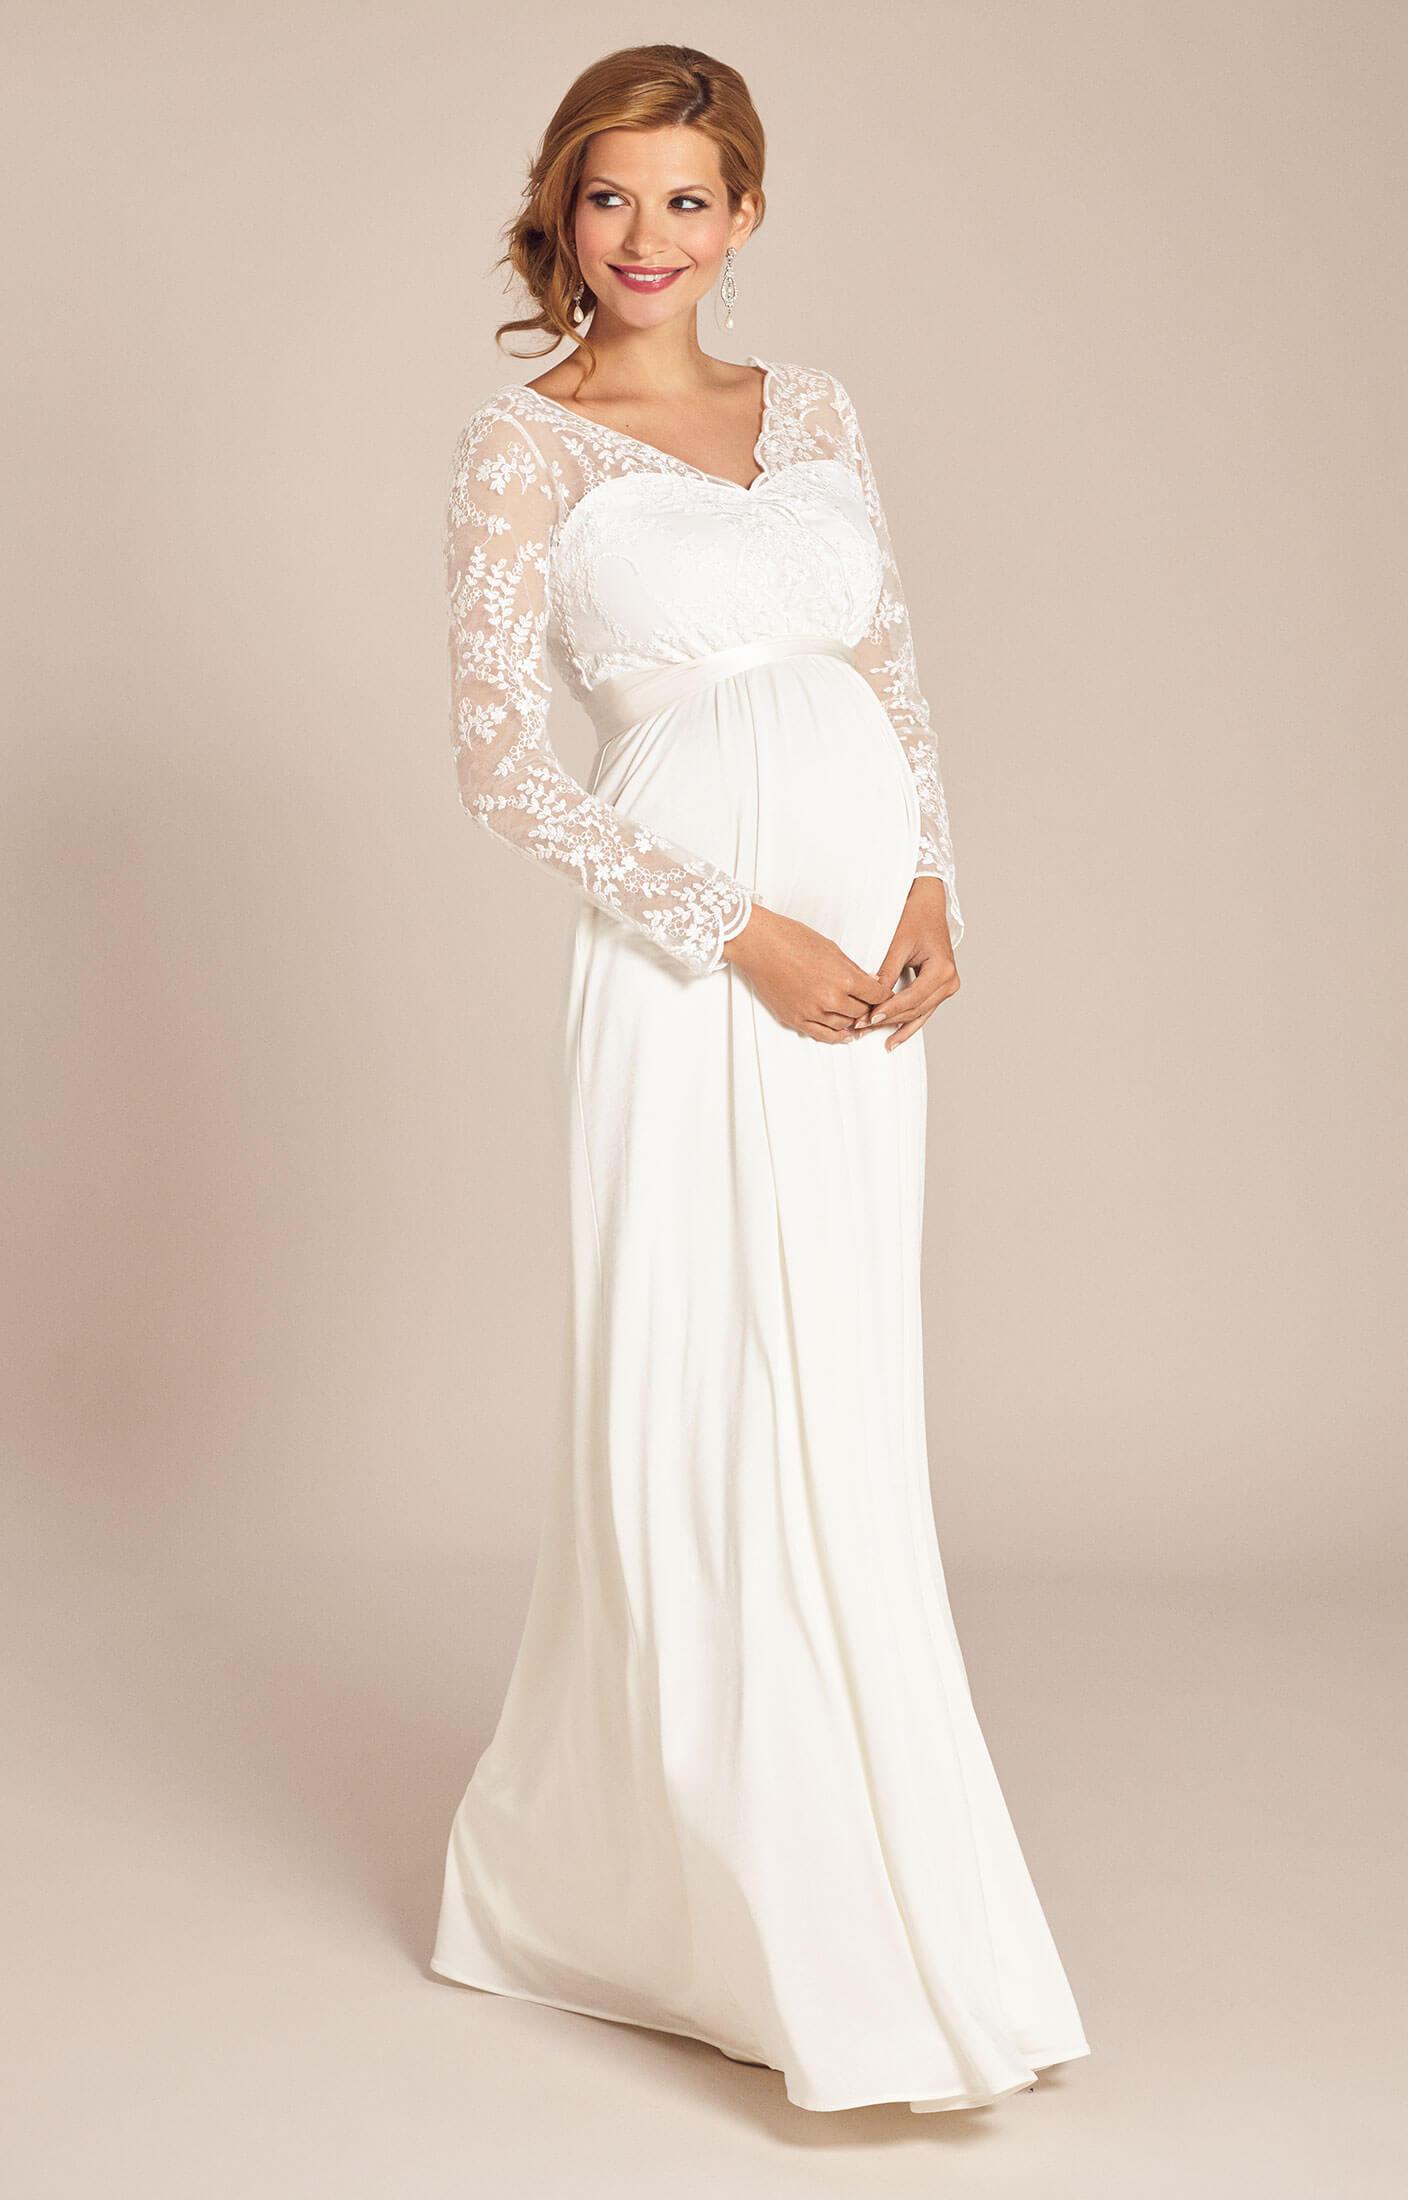 Rosalina maternity wedding gown ivory maternity wedding for Maternity dresses for wedding party